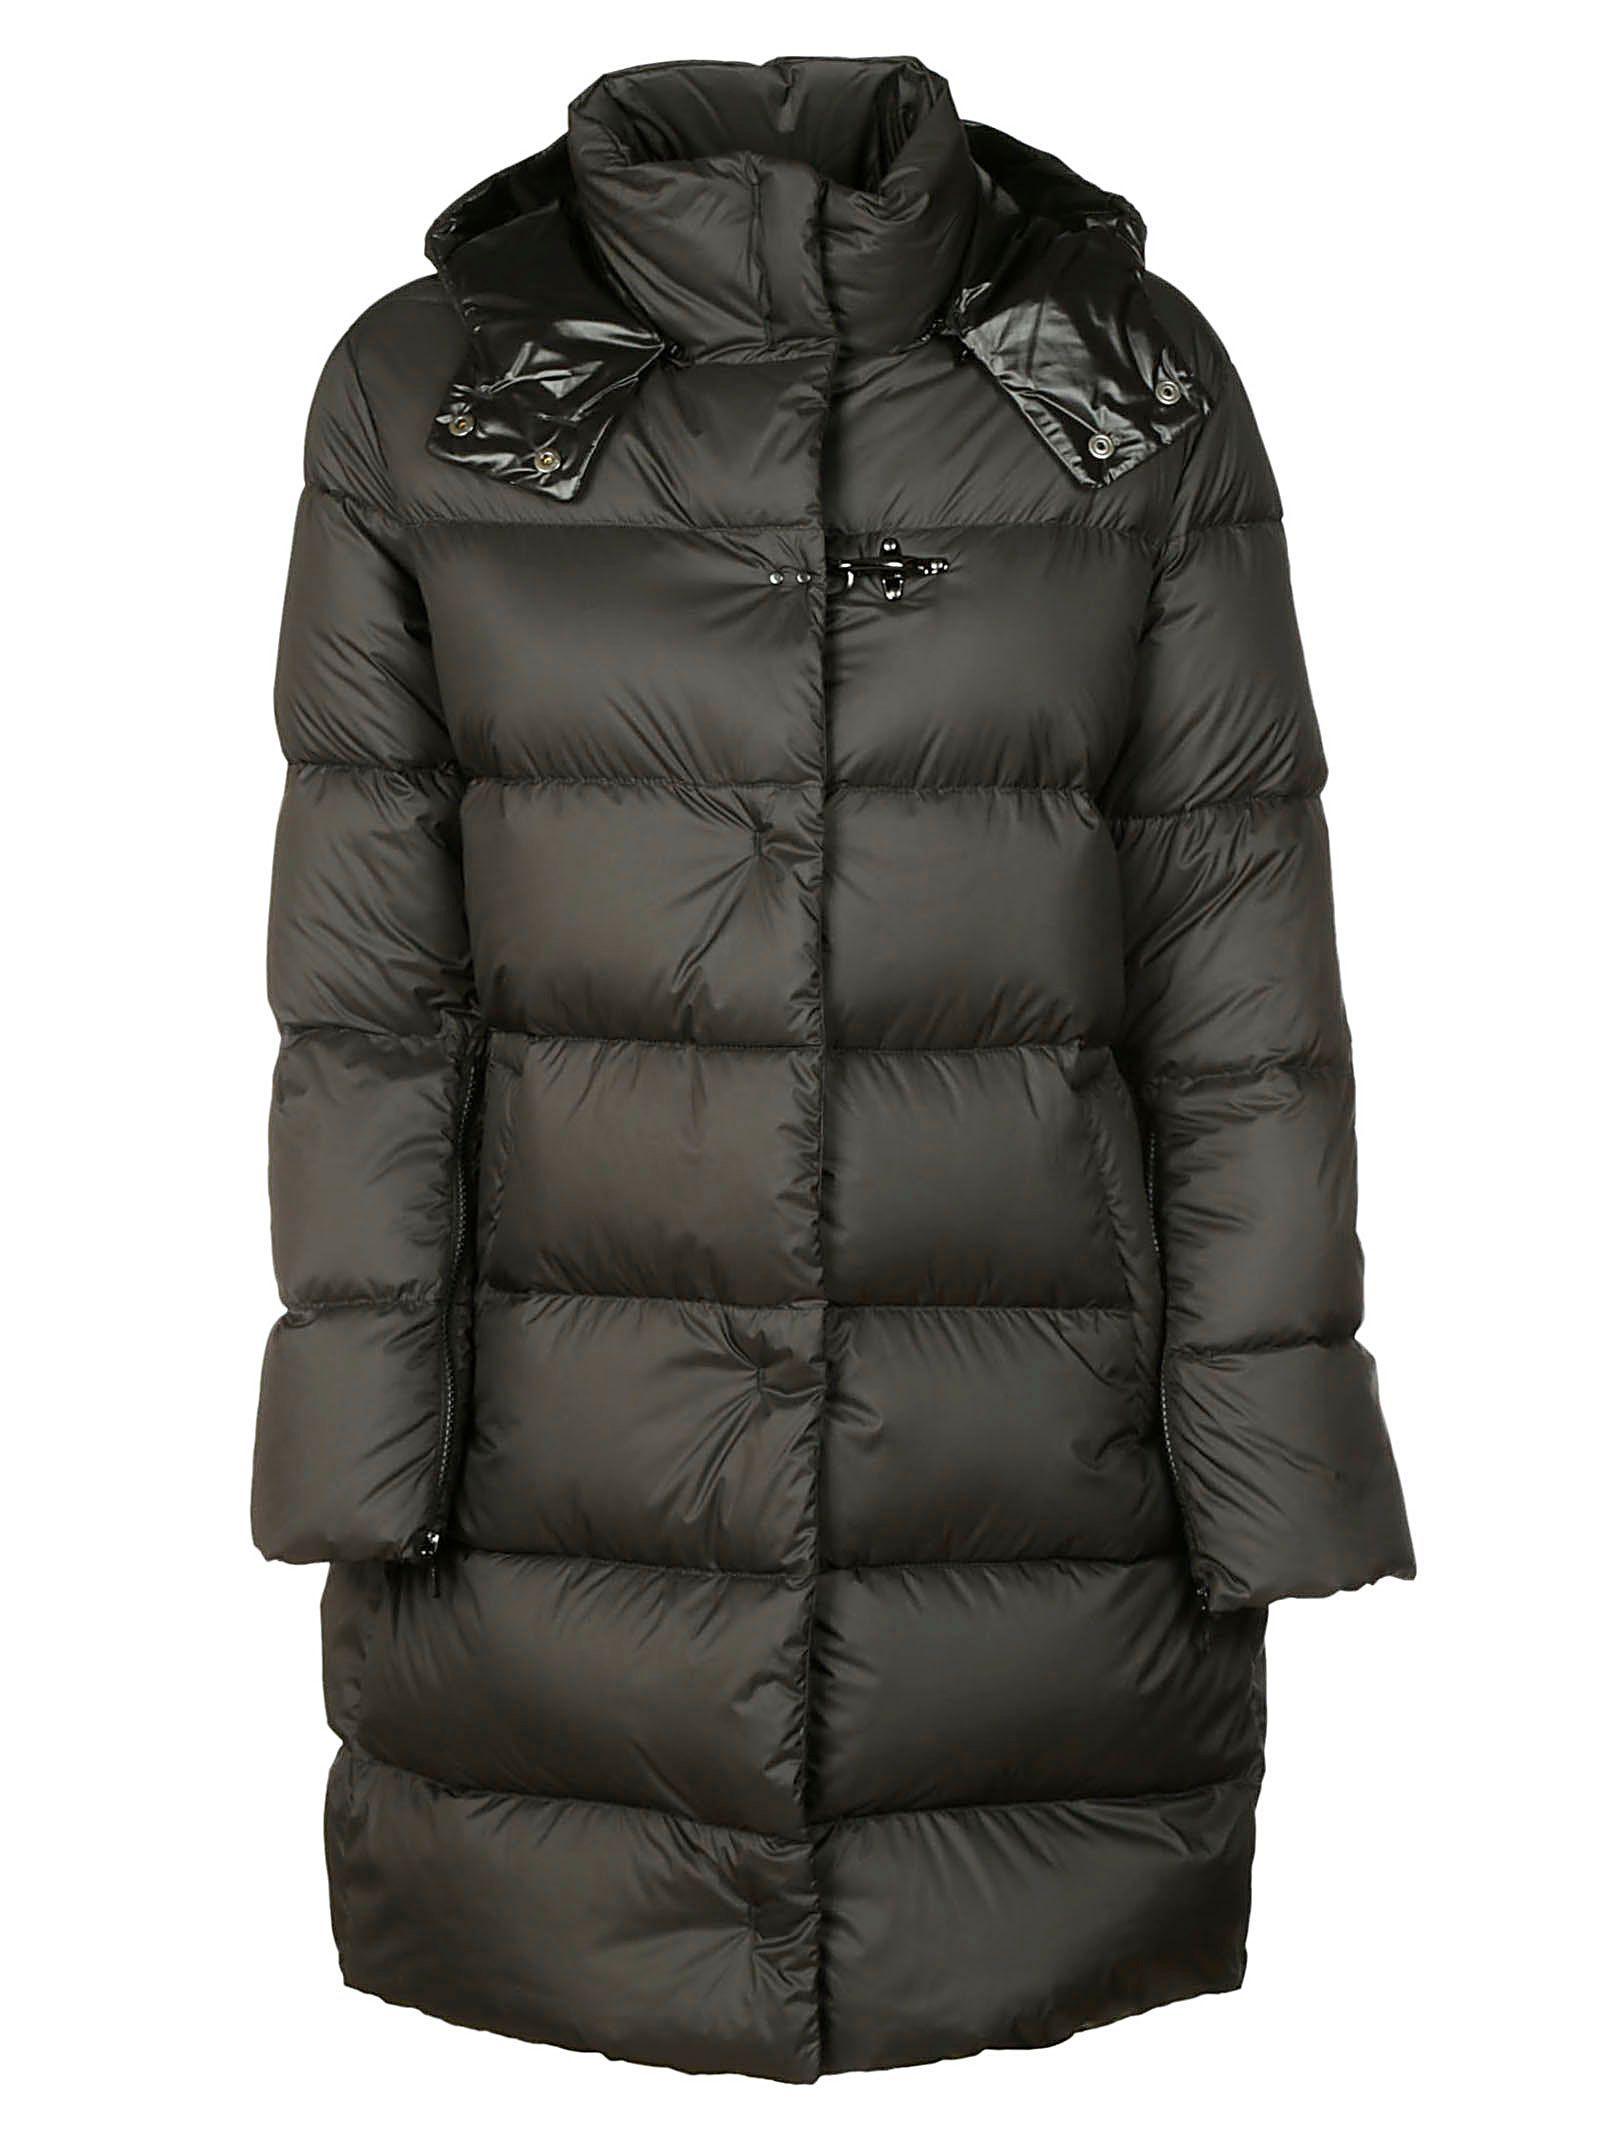 Fay Black Polyamide Outerwear Jacket Fay Cloth Outerwear Jackets Jackets Outerwear [ 2136 x 1600 Pixel ]